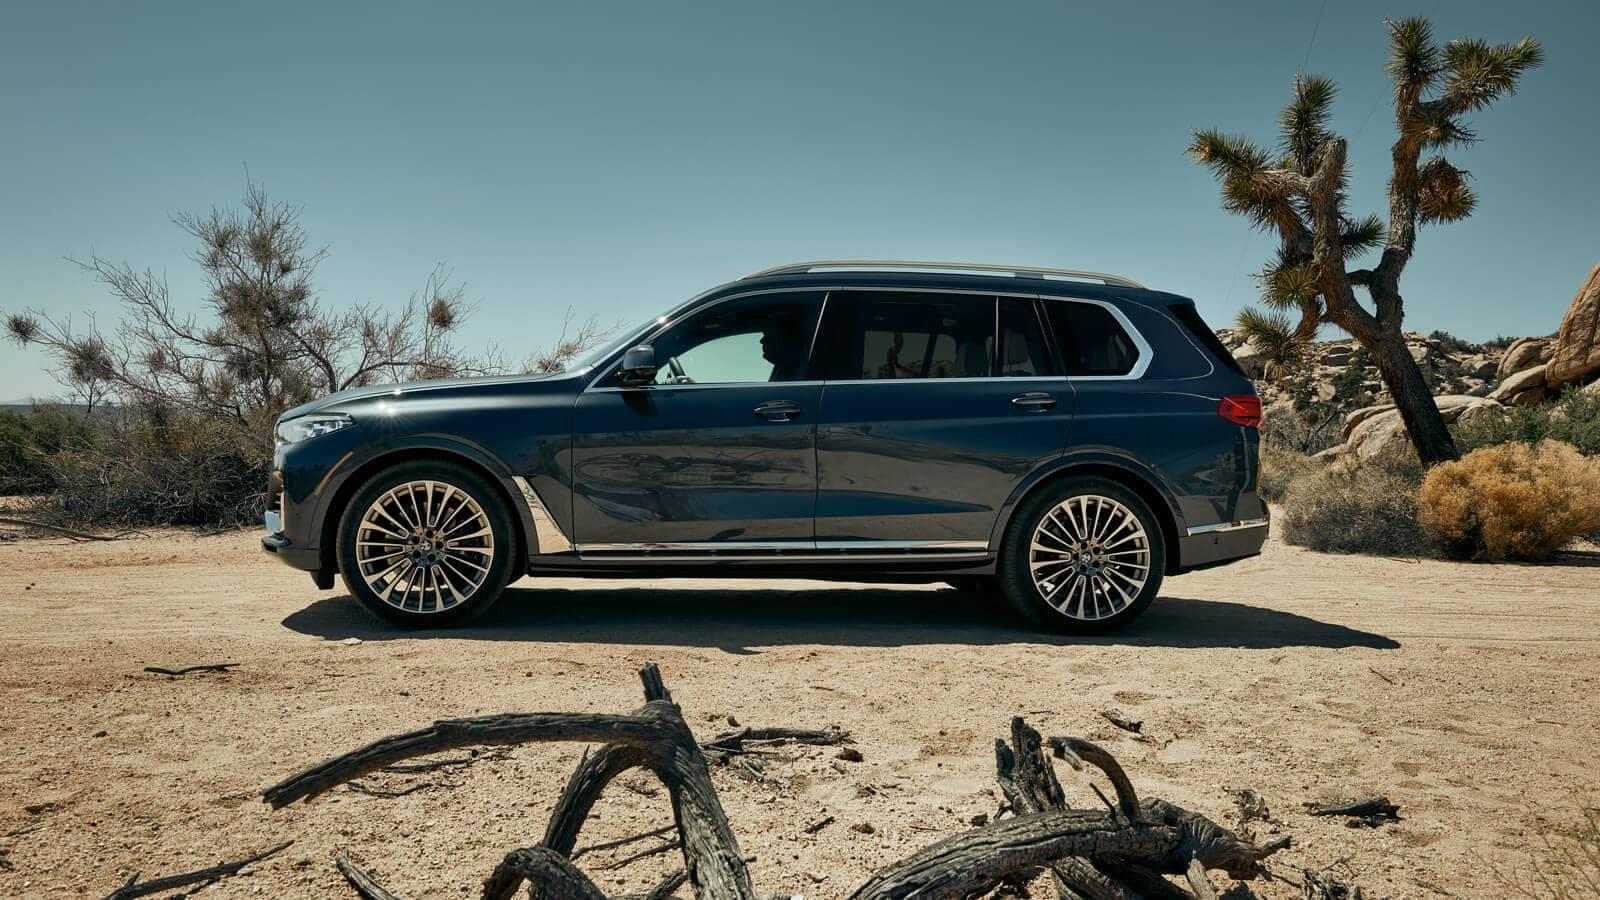 2019-BMW-X7-stunning-profile